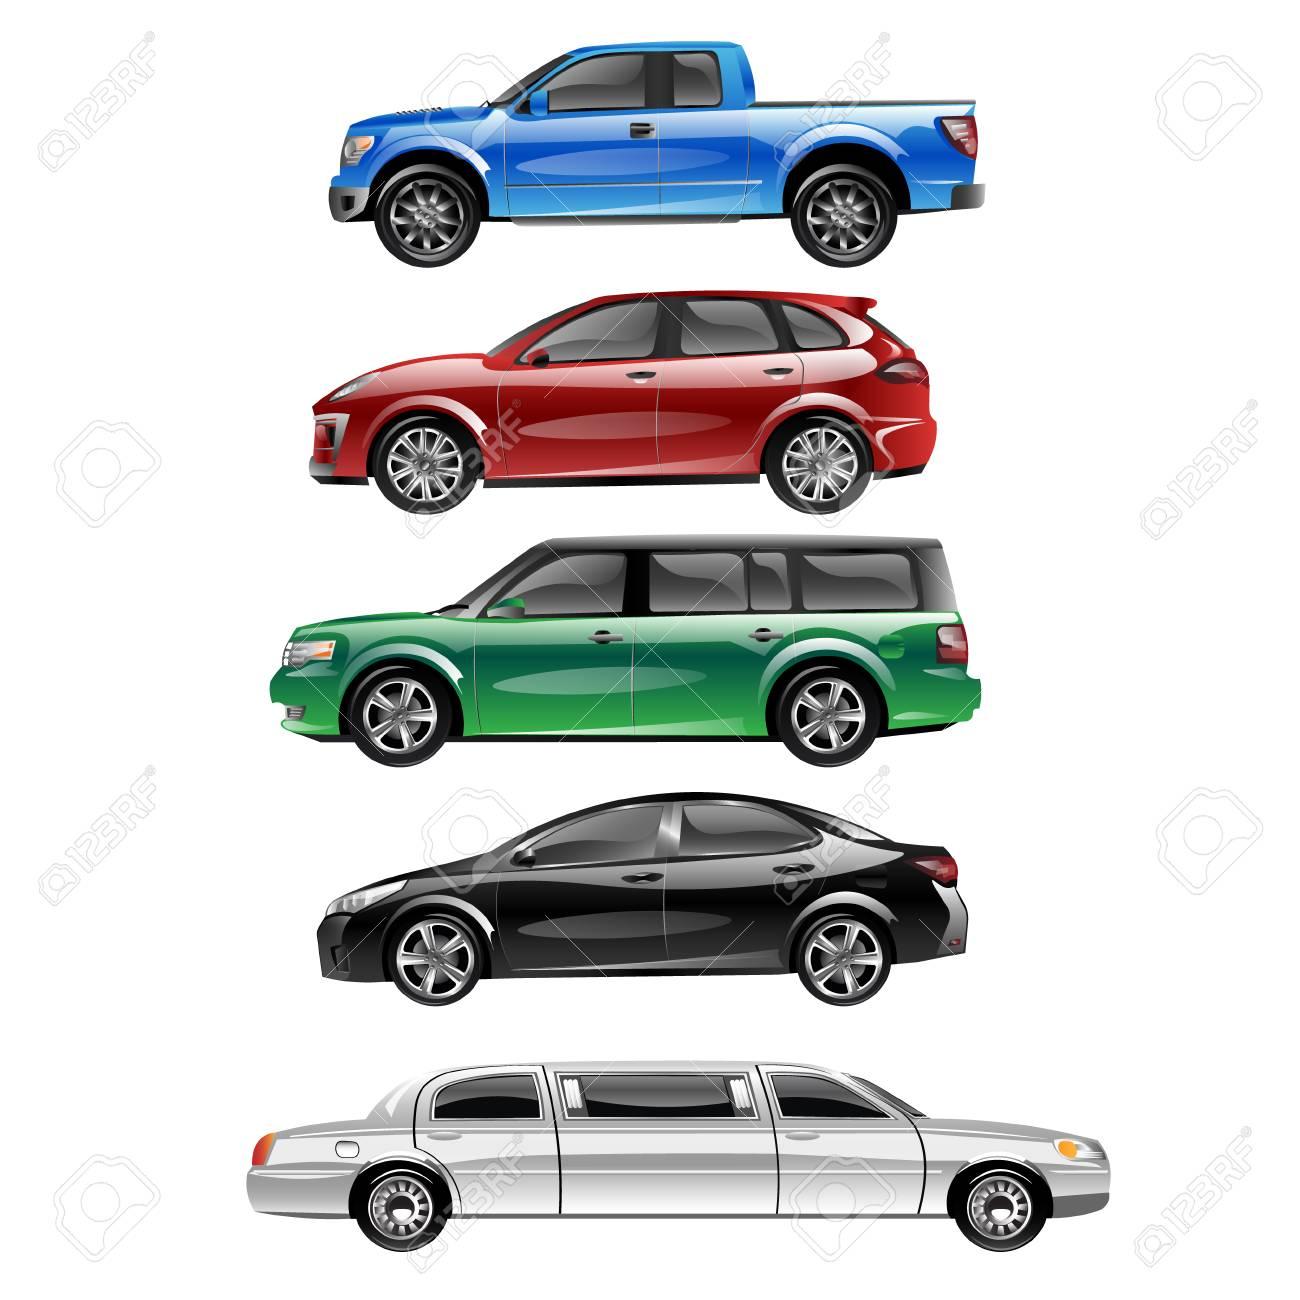 Different passenger car vector. - 82950215